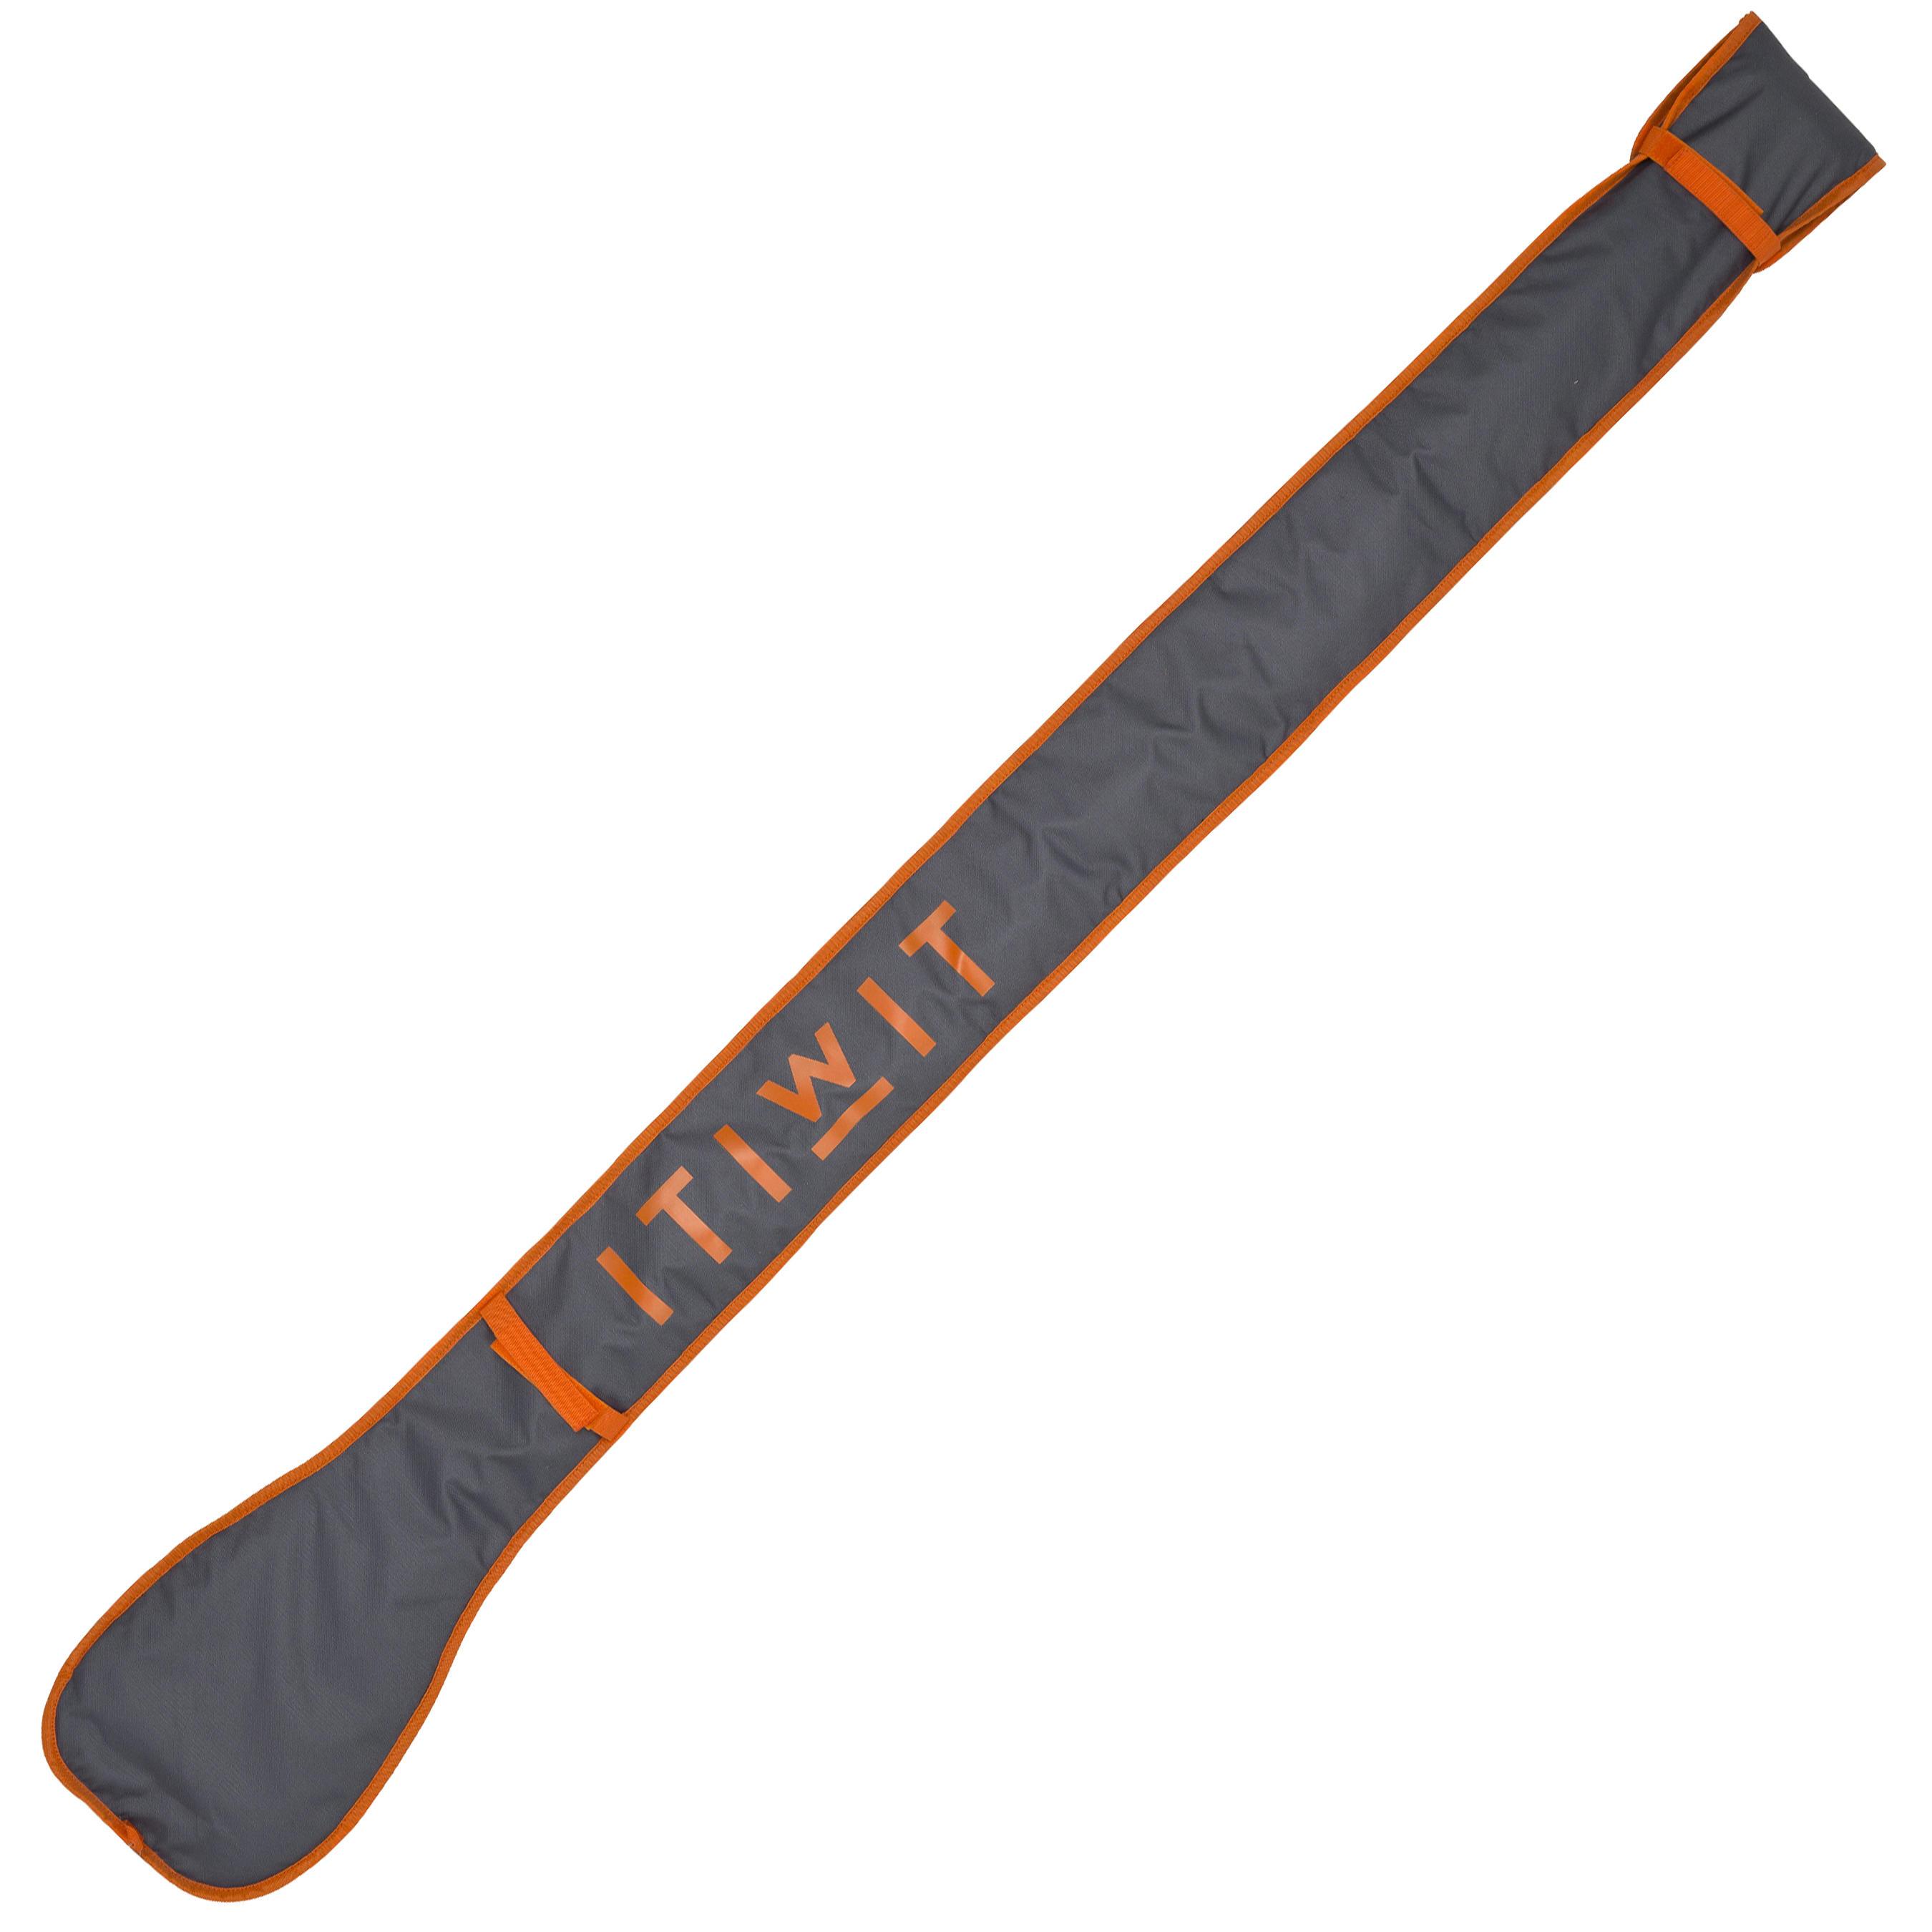 Itiwit Hoes SUP-peddel, grijs/oranje